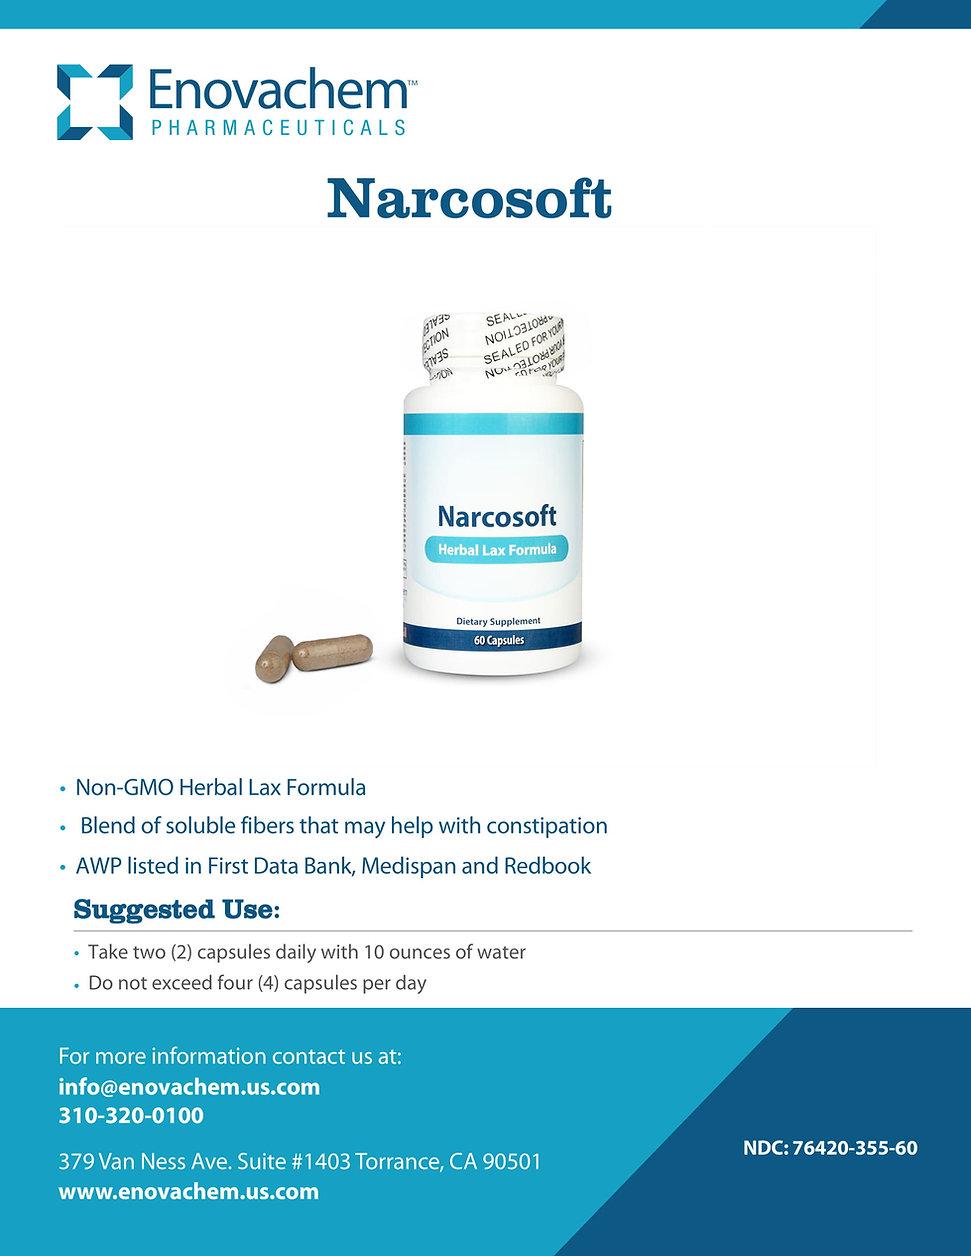 Narcosoft-1.jpg